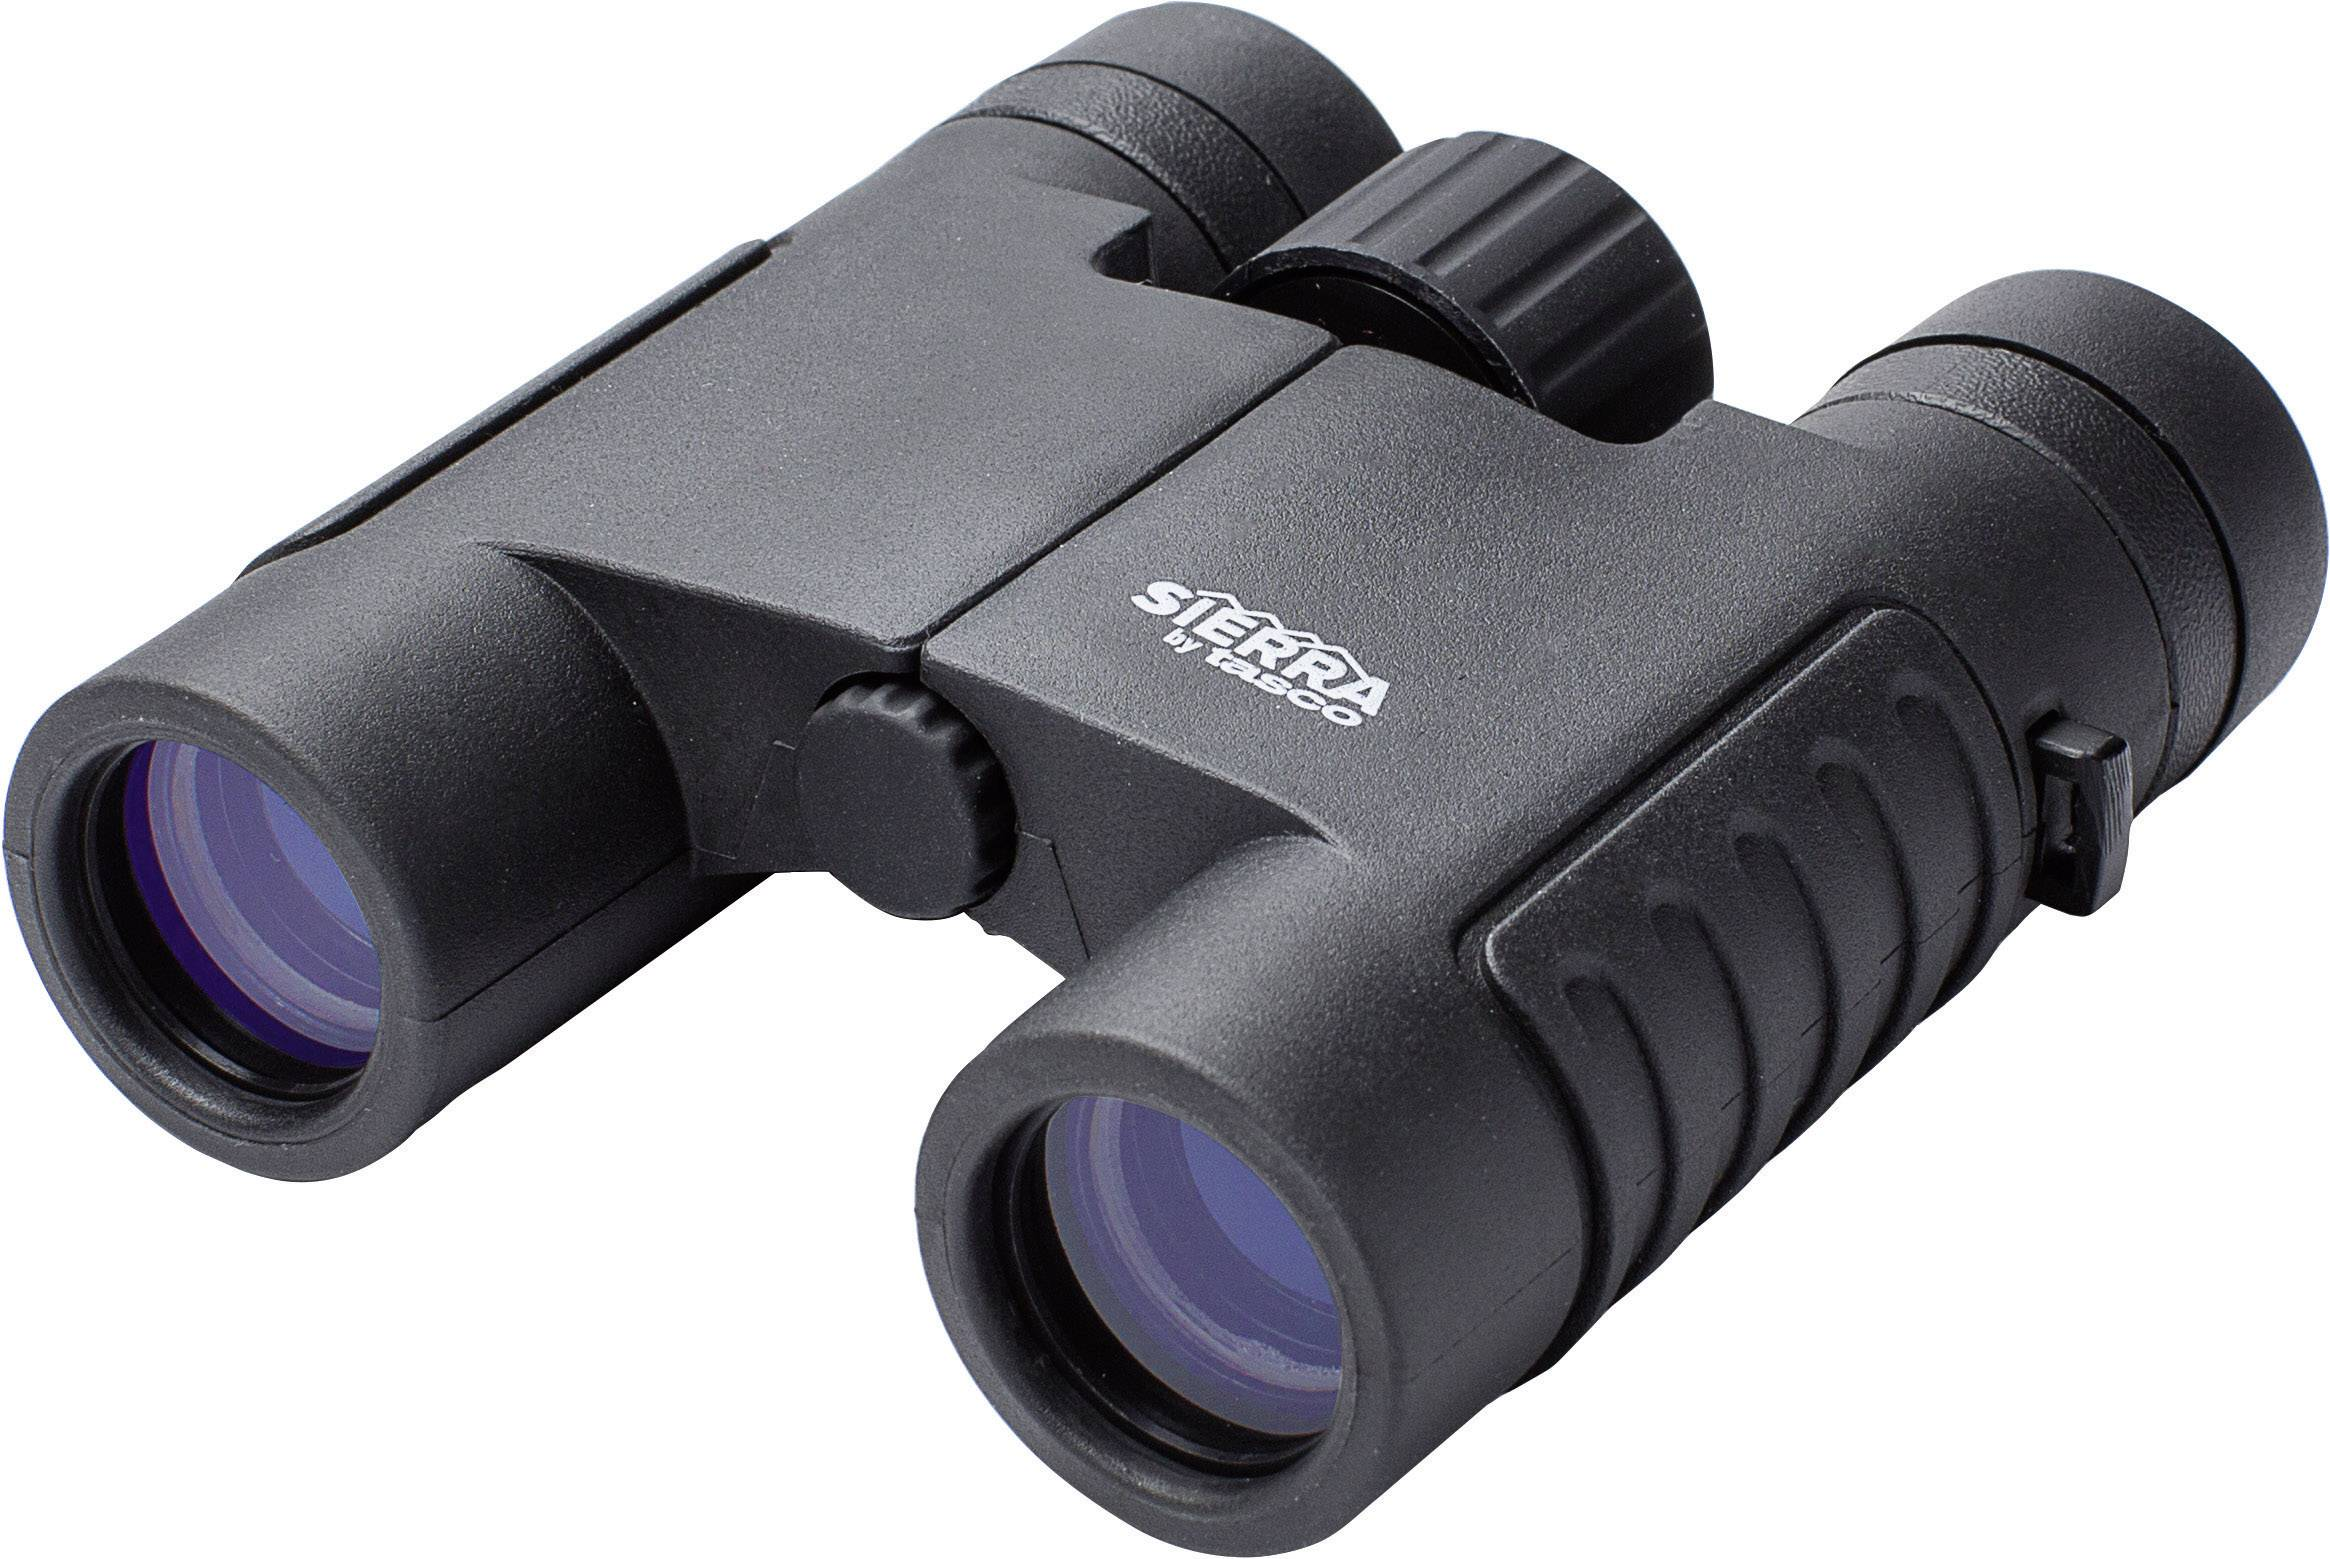 Dalekohled Tasco Sierra 10x25 B TS1025B, 10 x 25 mm, černá